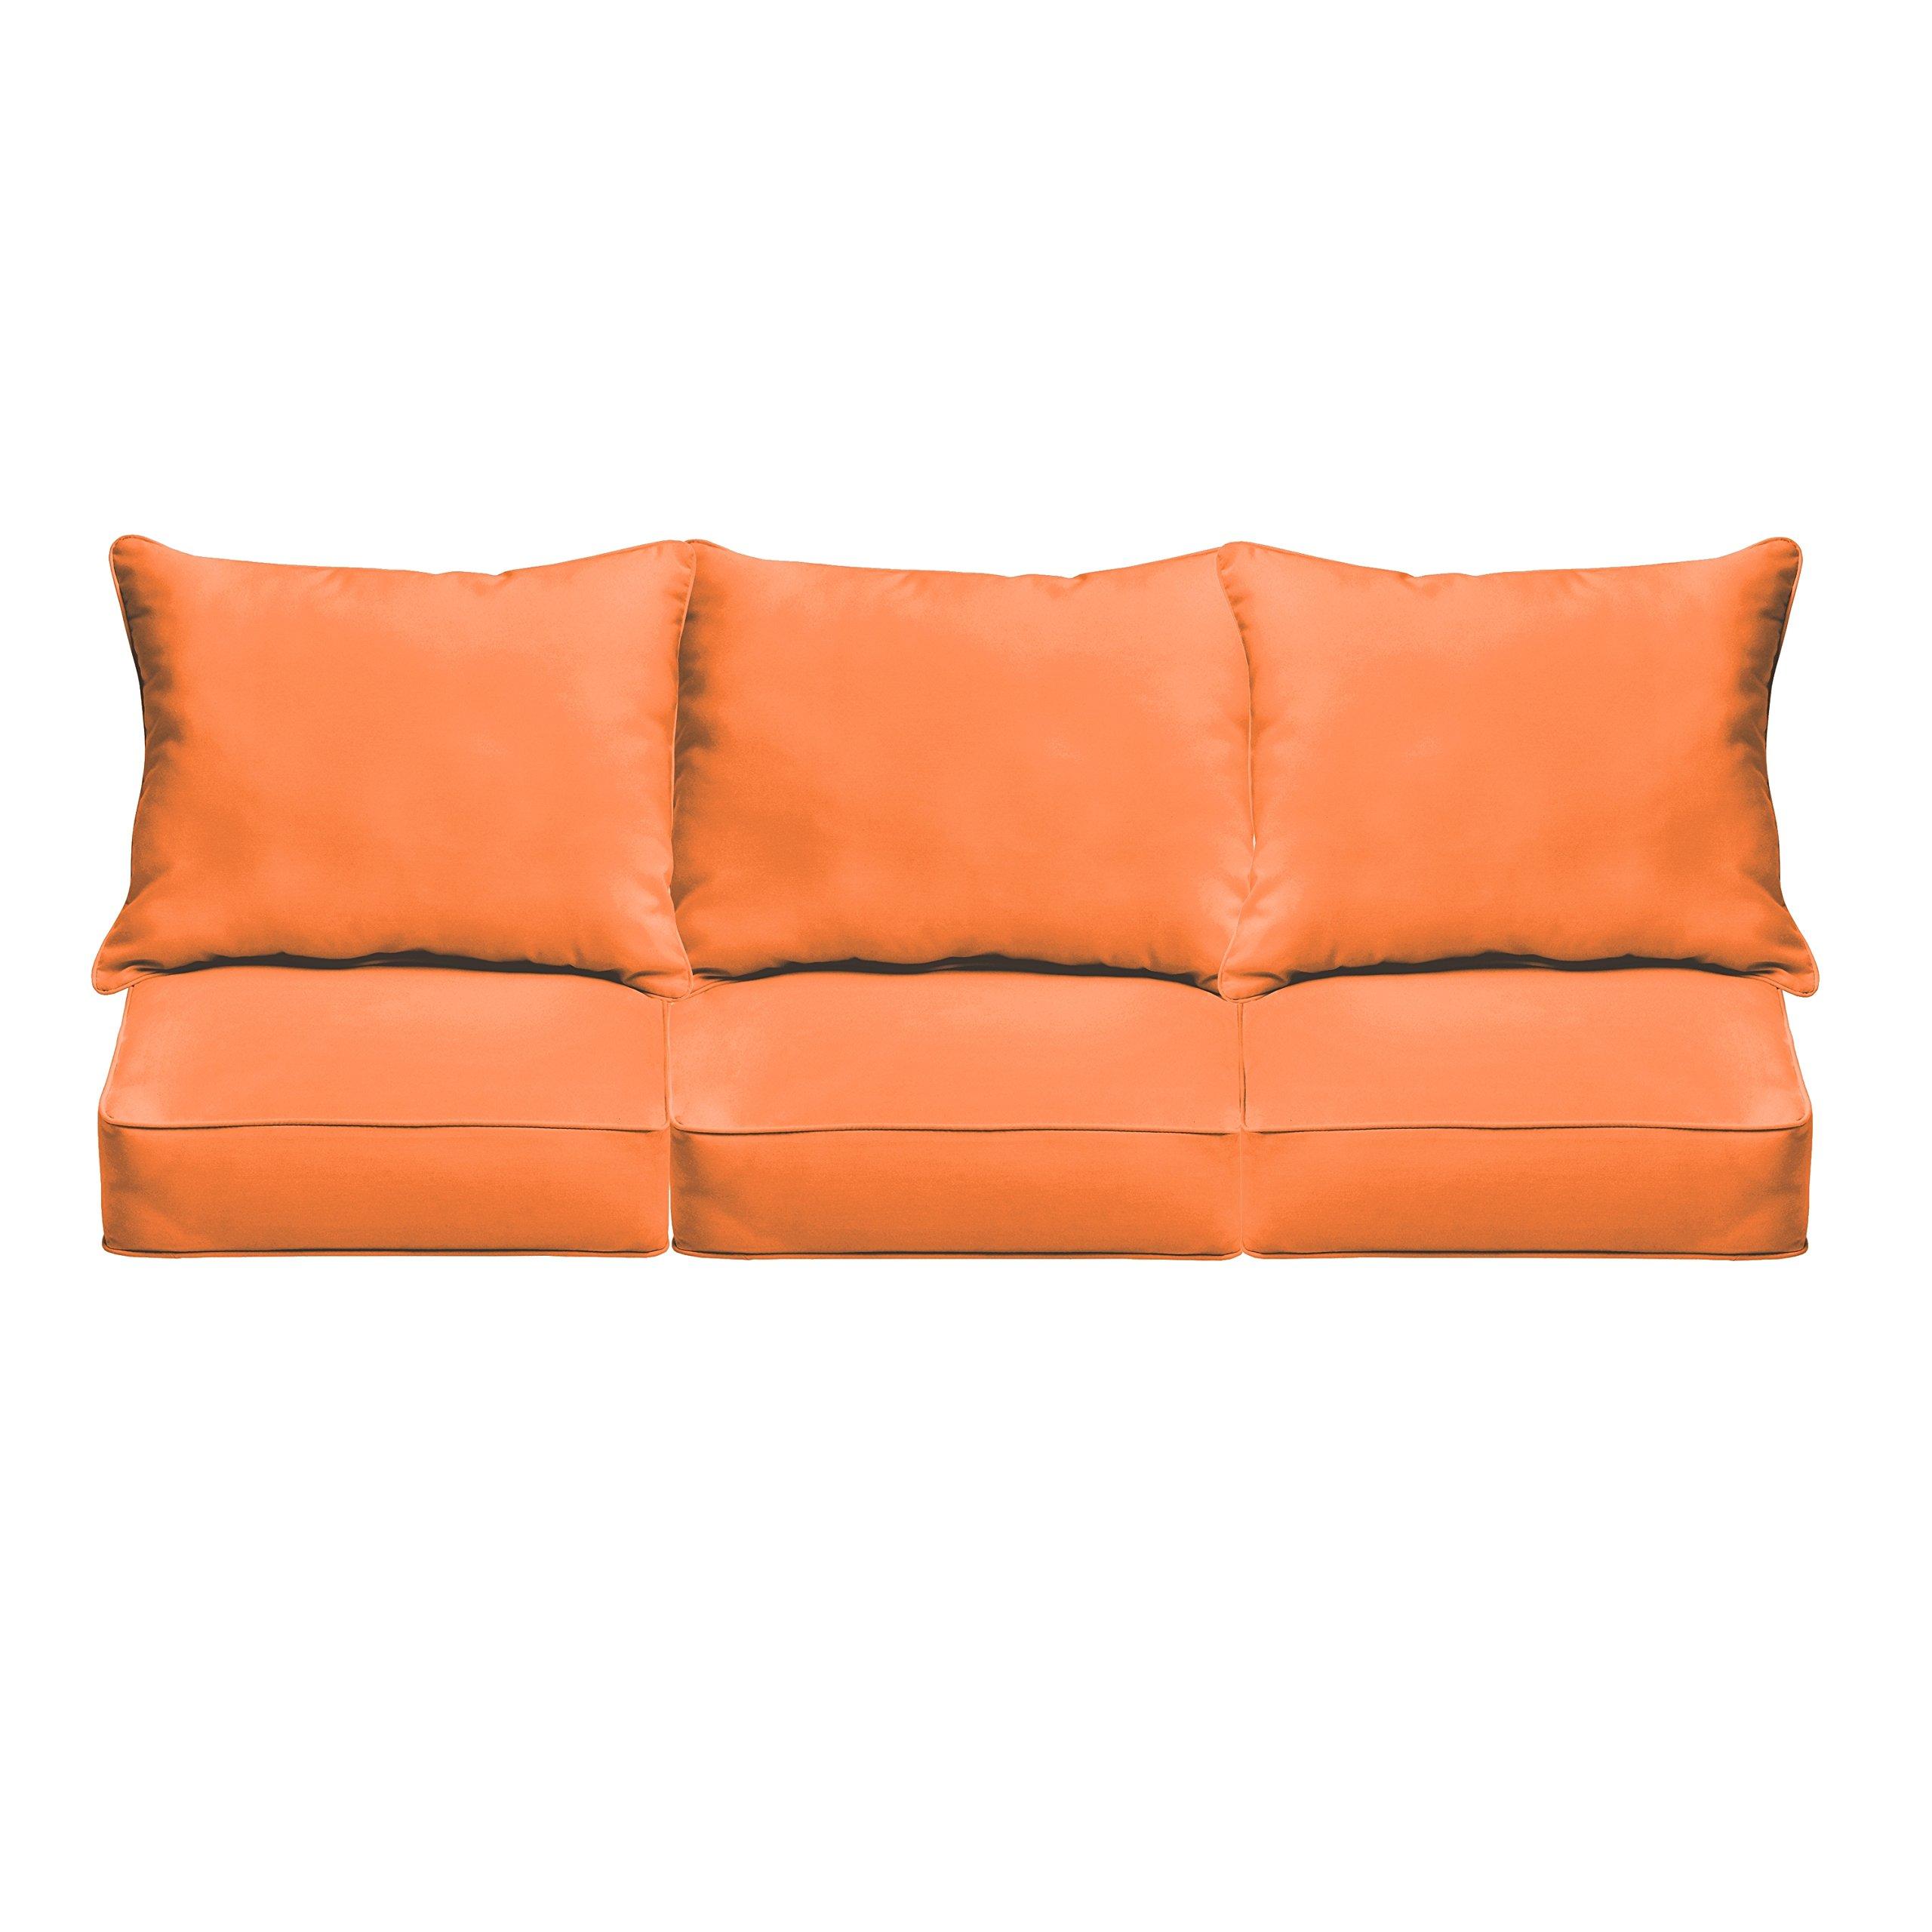 Mozaic AZPCSET4364 Swavelle Corded Outdoor Sofa Set, 23'' x 25'' x 5'', Bright Orange